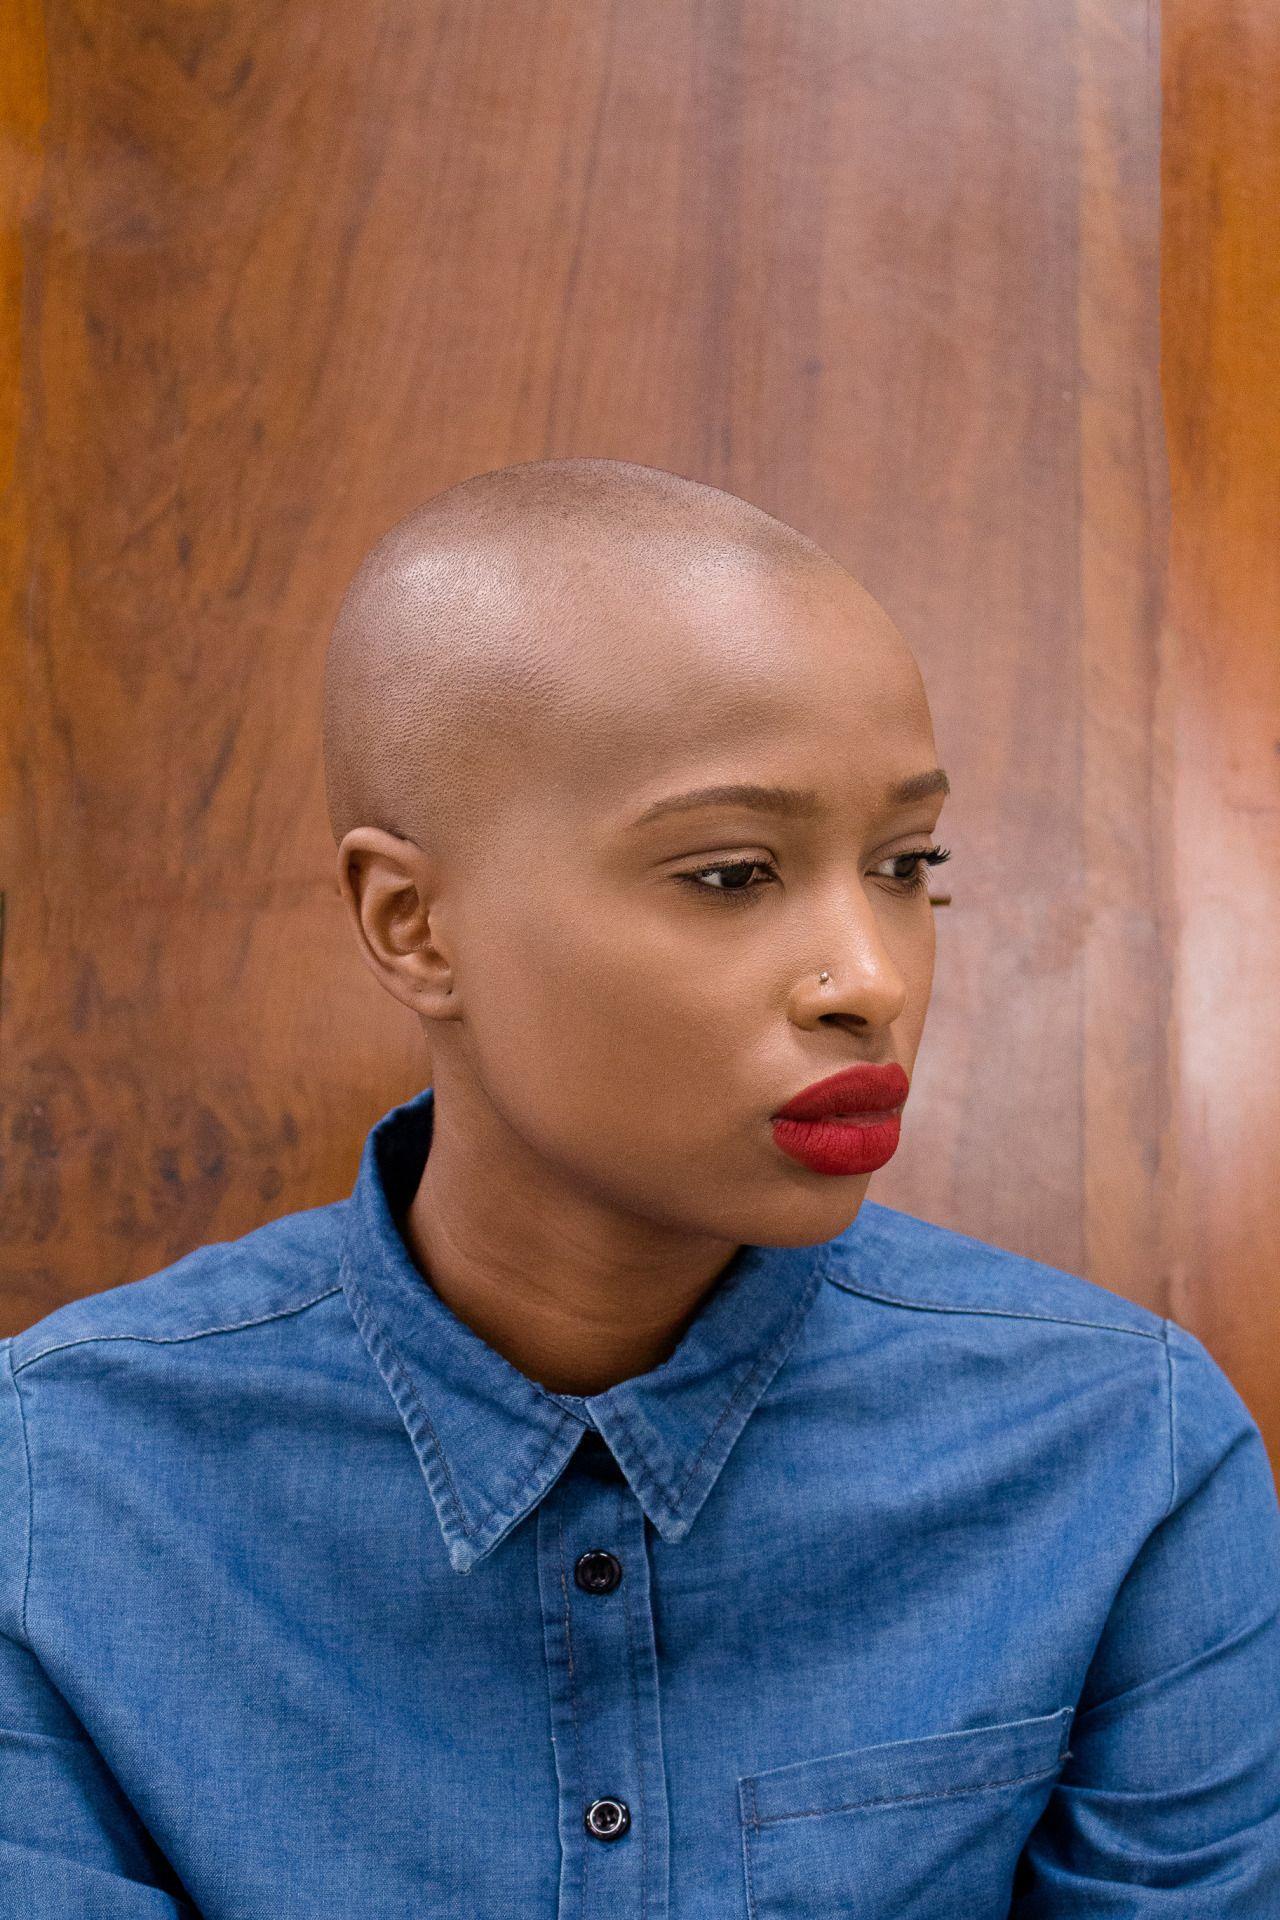 baldblackbeauties | Bald women, Bald girl, Bald head women